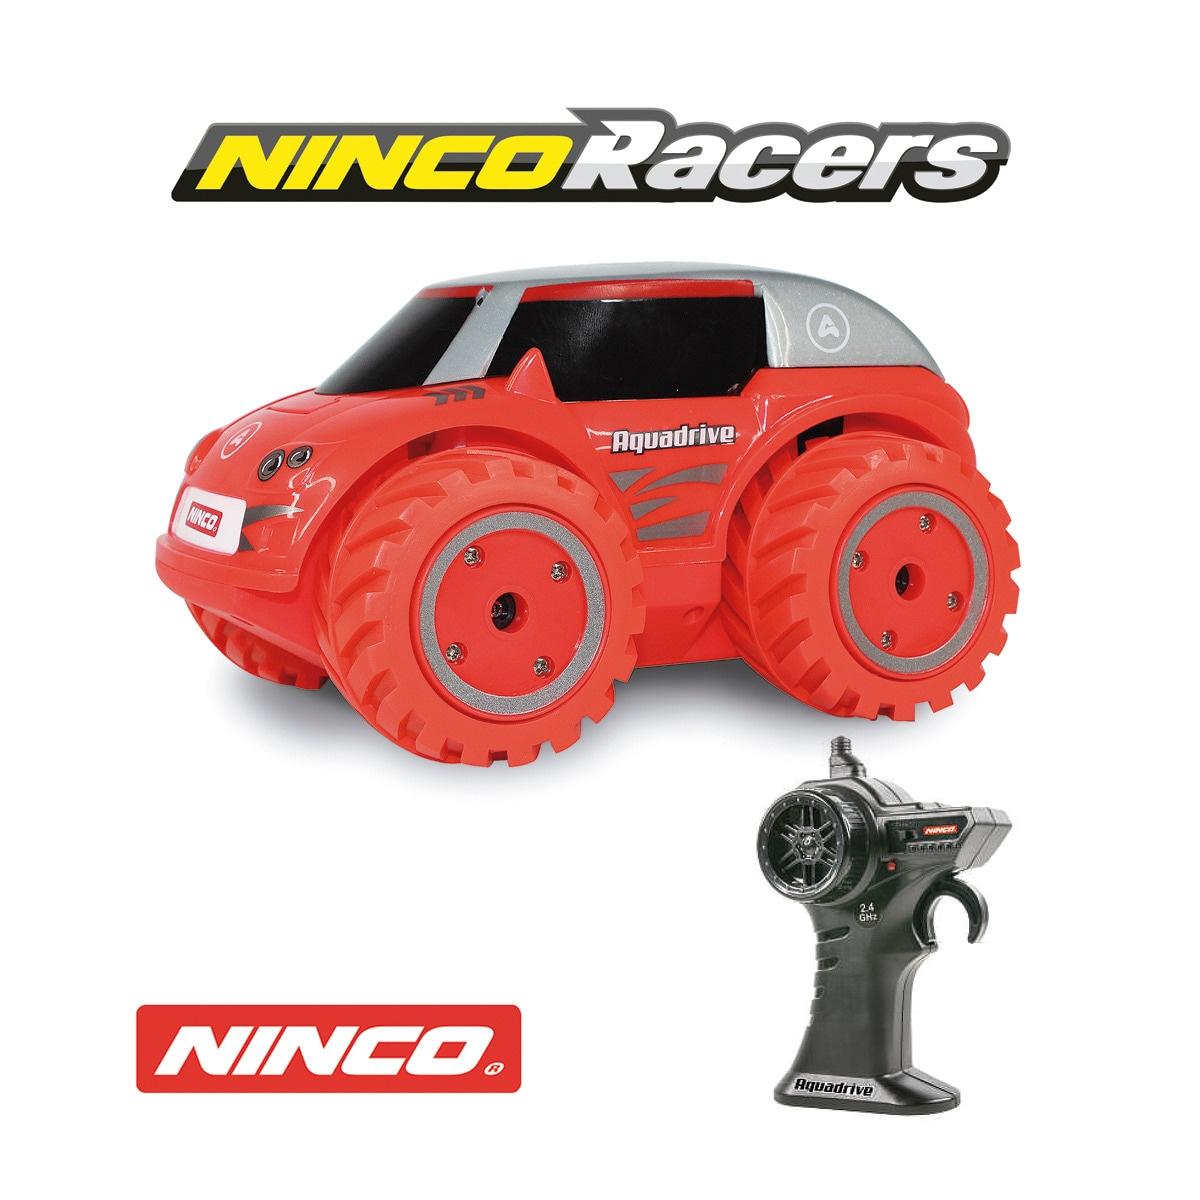 COCHE RADIO CONTROL AQUADRIVE NINCORACERS NH93148 - N77020